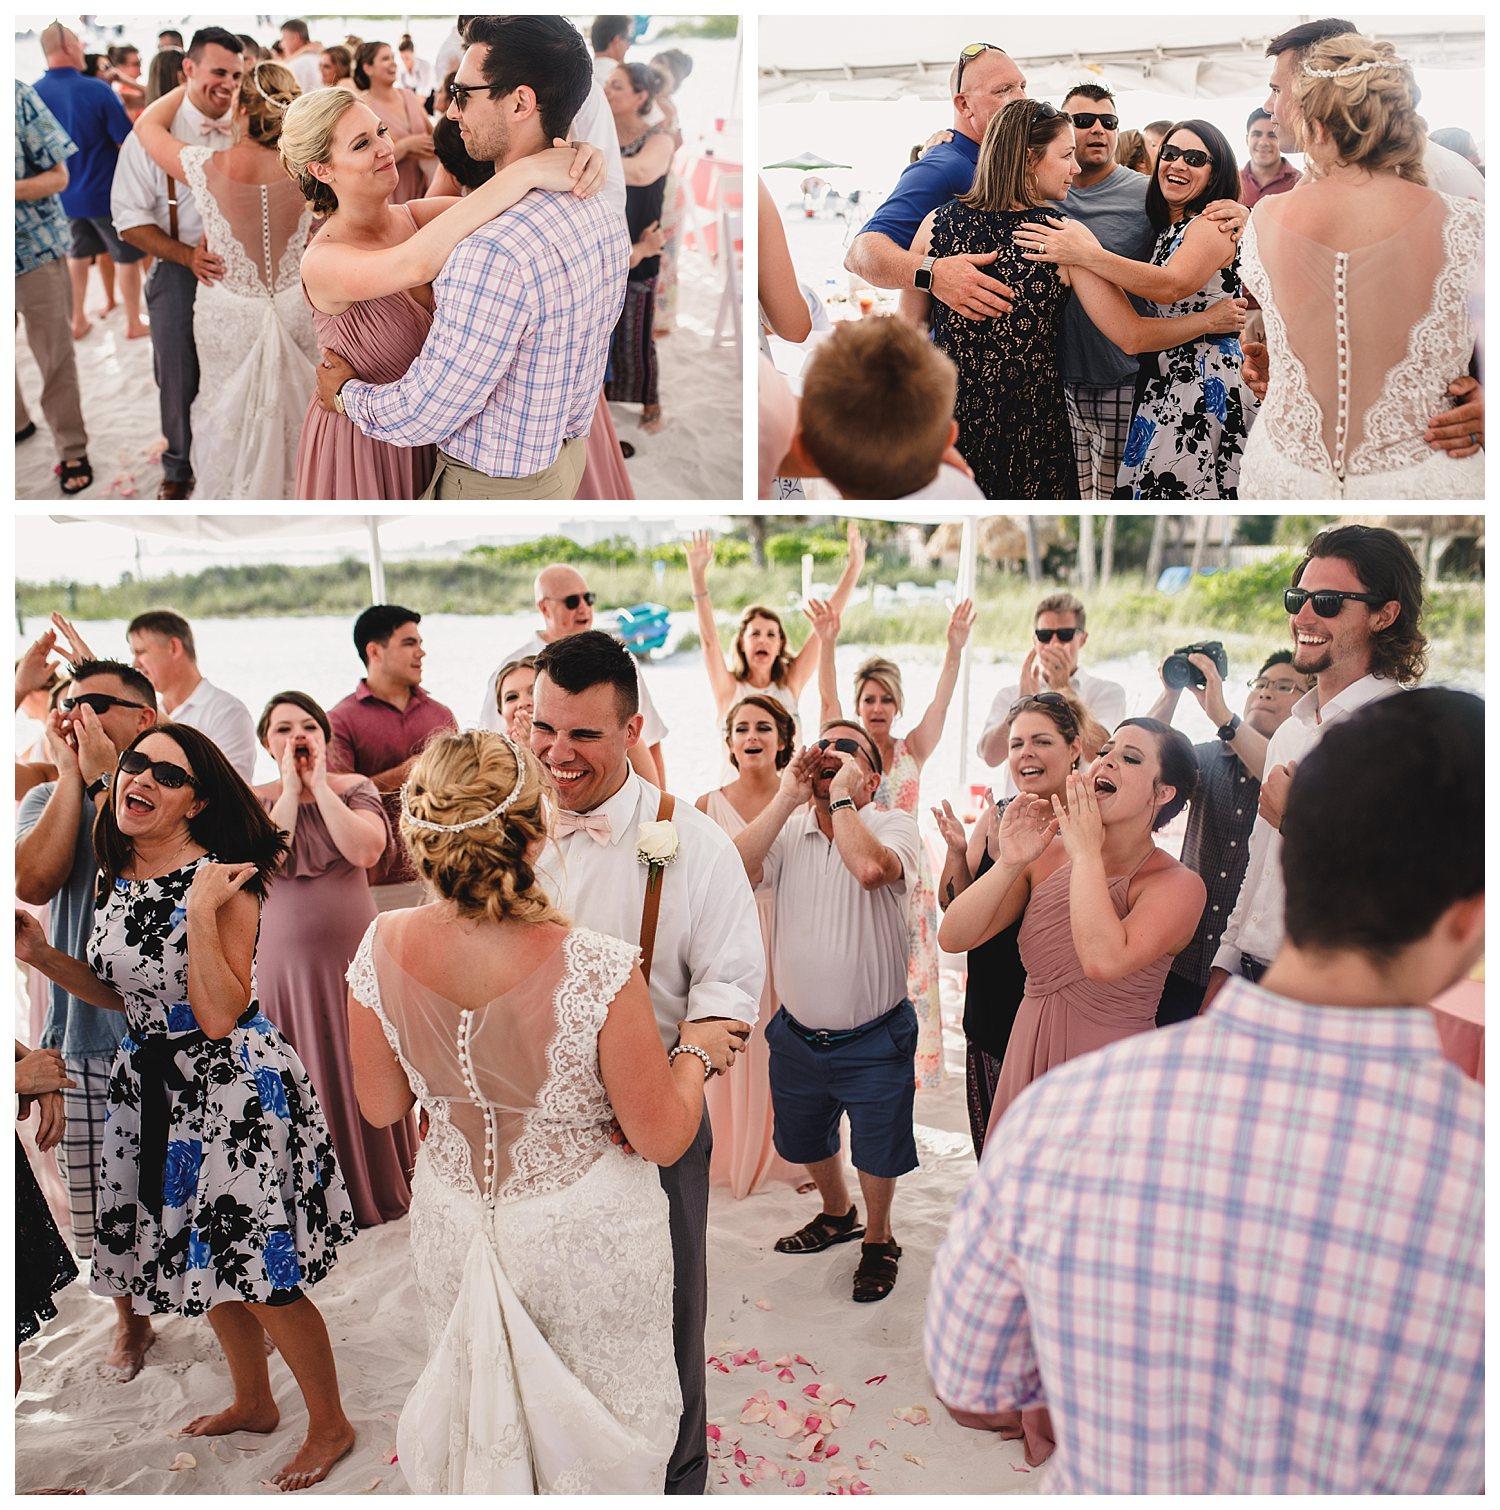 Kelsey_Diane_Photography_Destination_Wedding_Sarasota_Florida_Beach_Wedding_Alex_Austin_0664.jpg